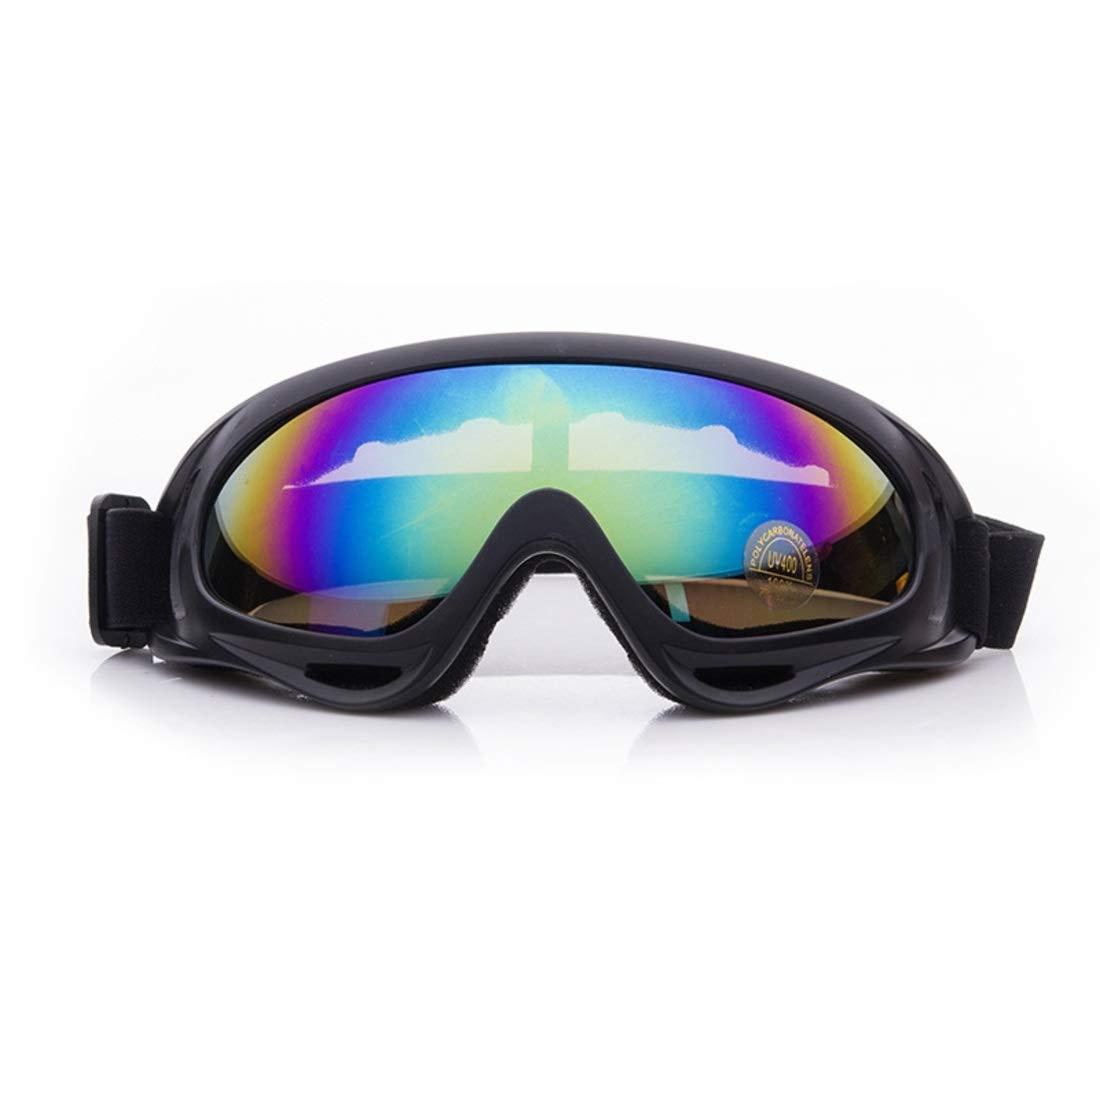 BAOYIT Polarized Outdoor Anti-Fog Skiing Windproof Eyewear Riding Motorcycle Glasses for Women Men (Color : C) by BAOYIT